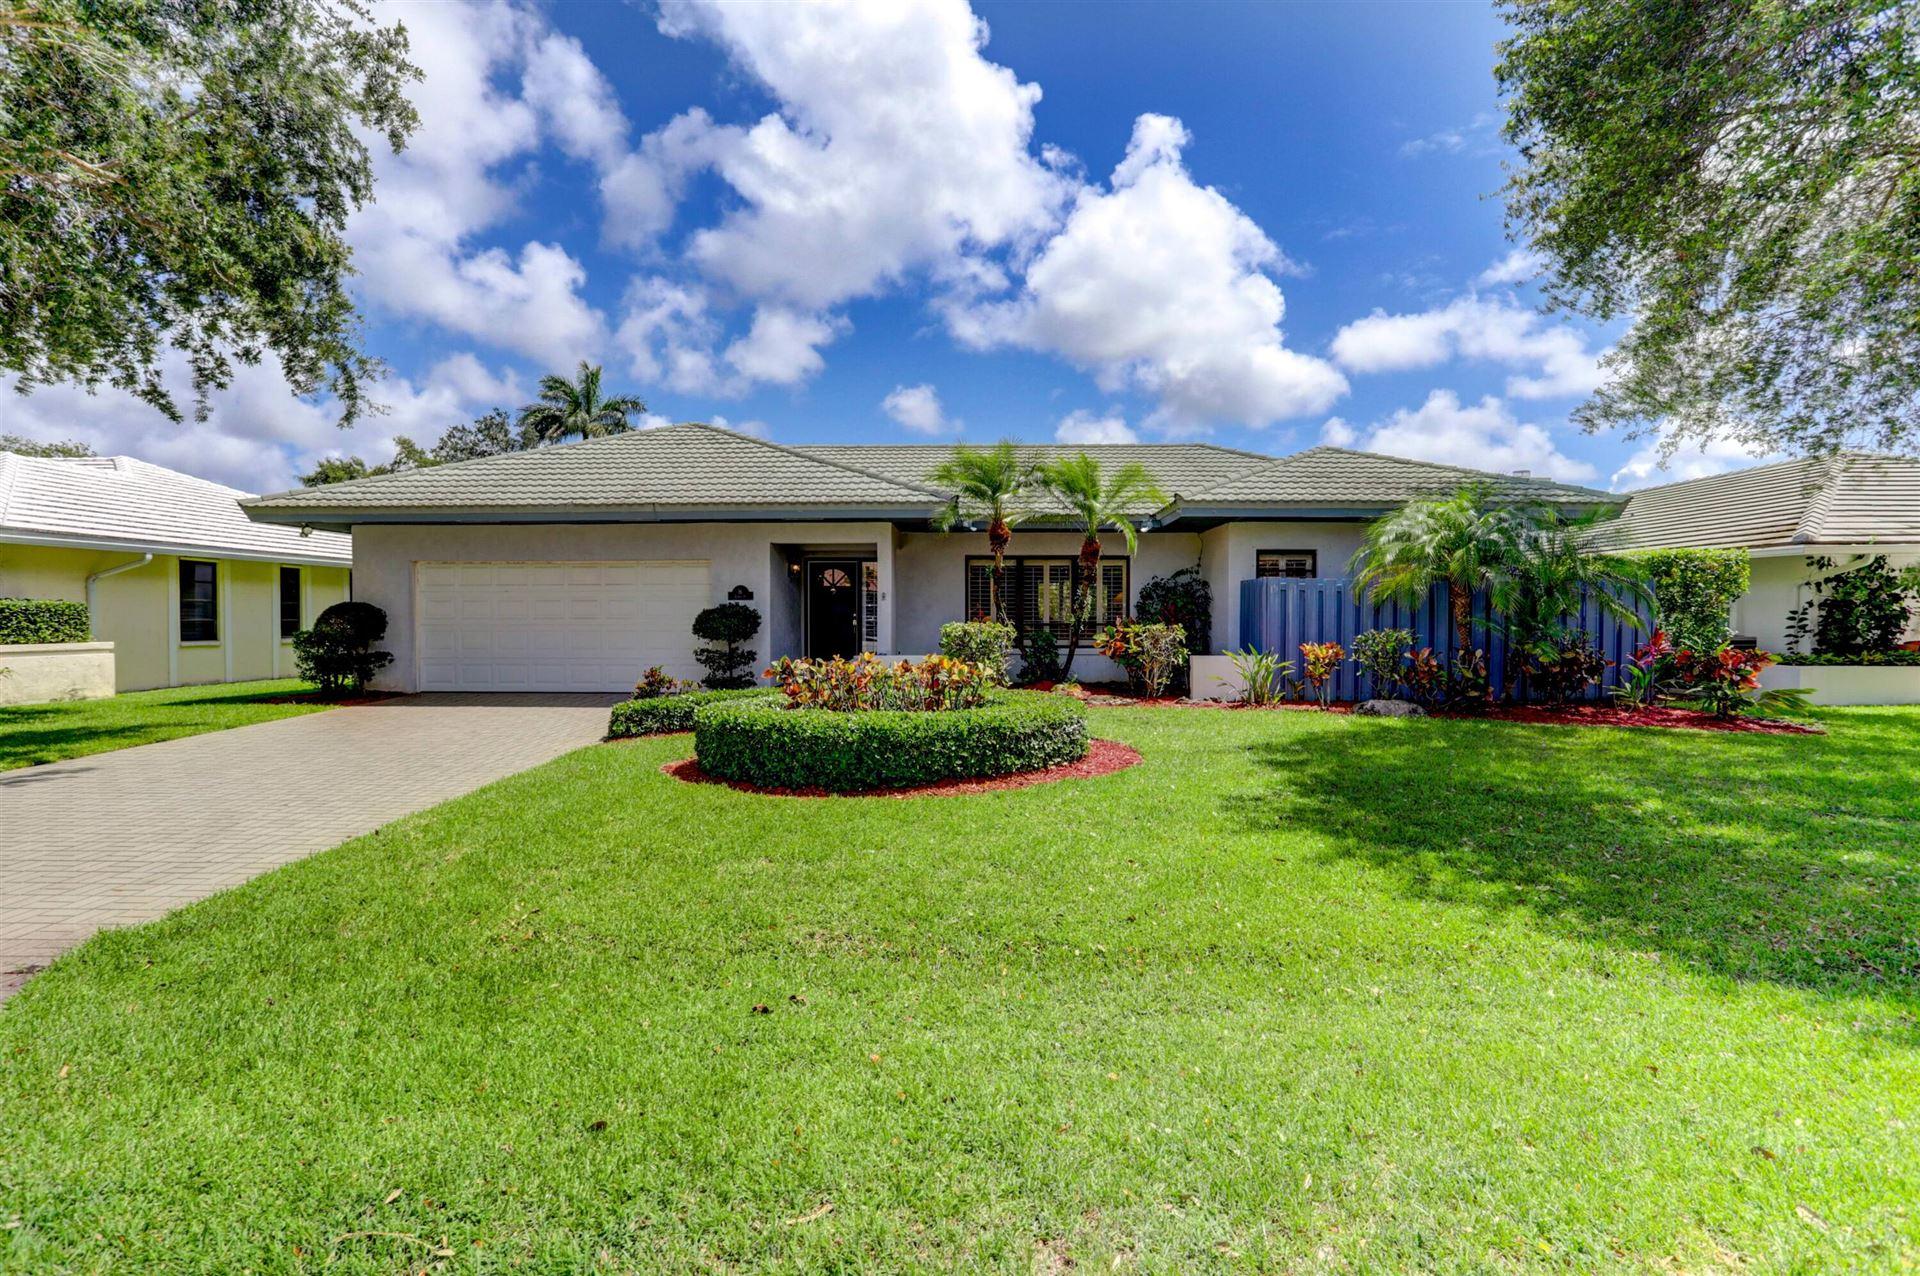 Photo of 16 Glengary Road, Palm Beach Gardens, FL 33418 (MLS # RX-10731285)